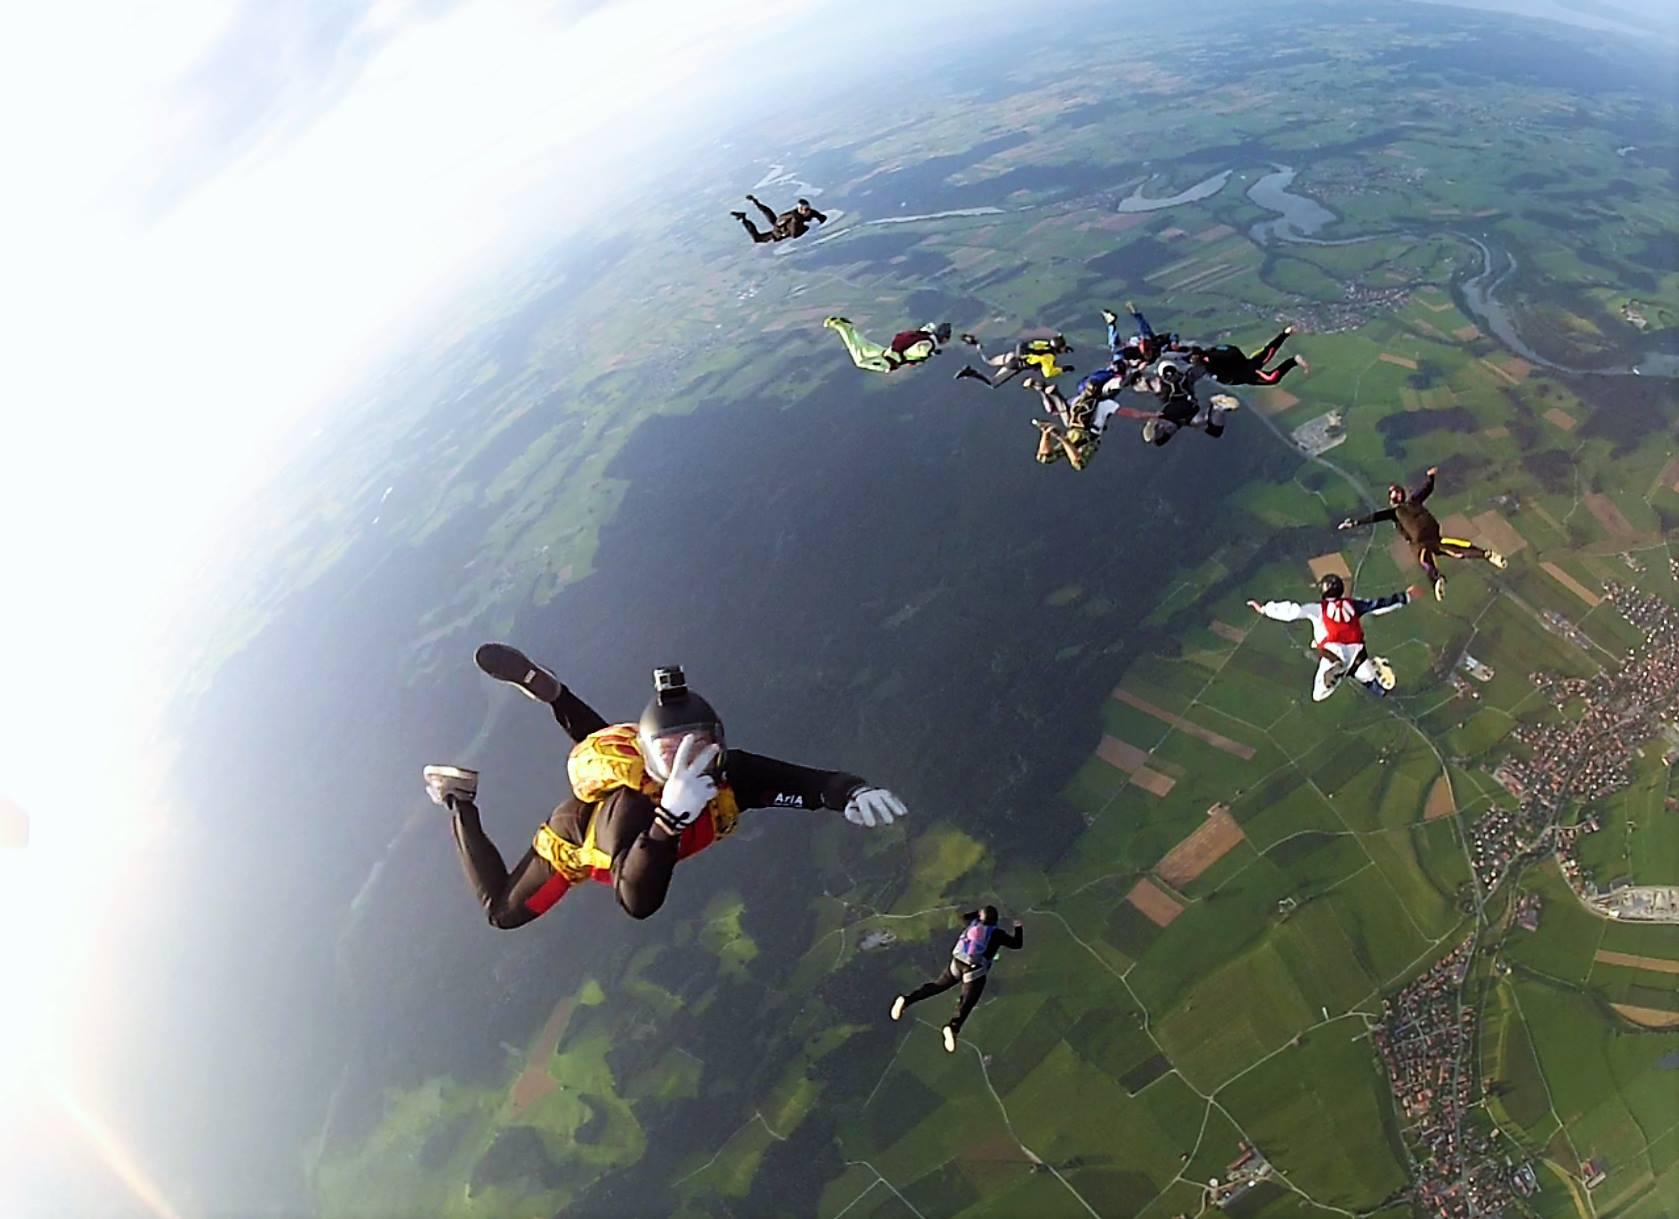 Fallschirmsportring Club 2000, Skydive Altenstadt